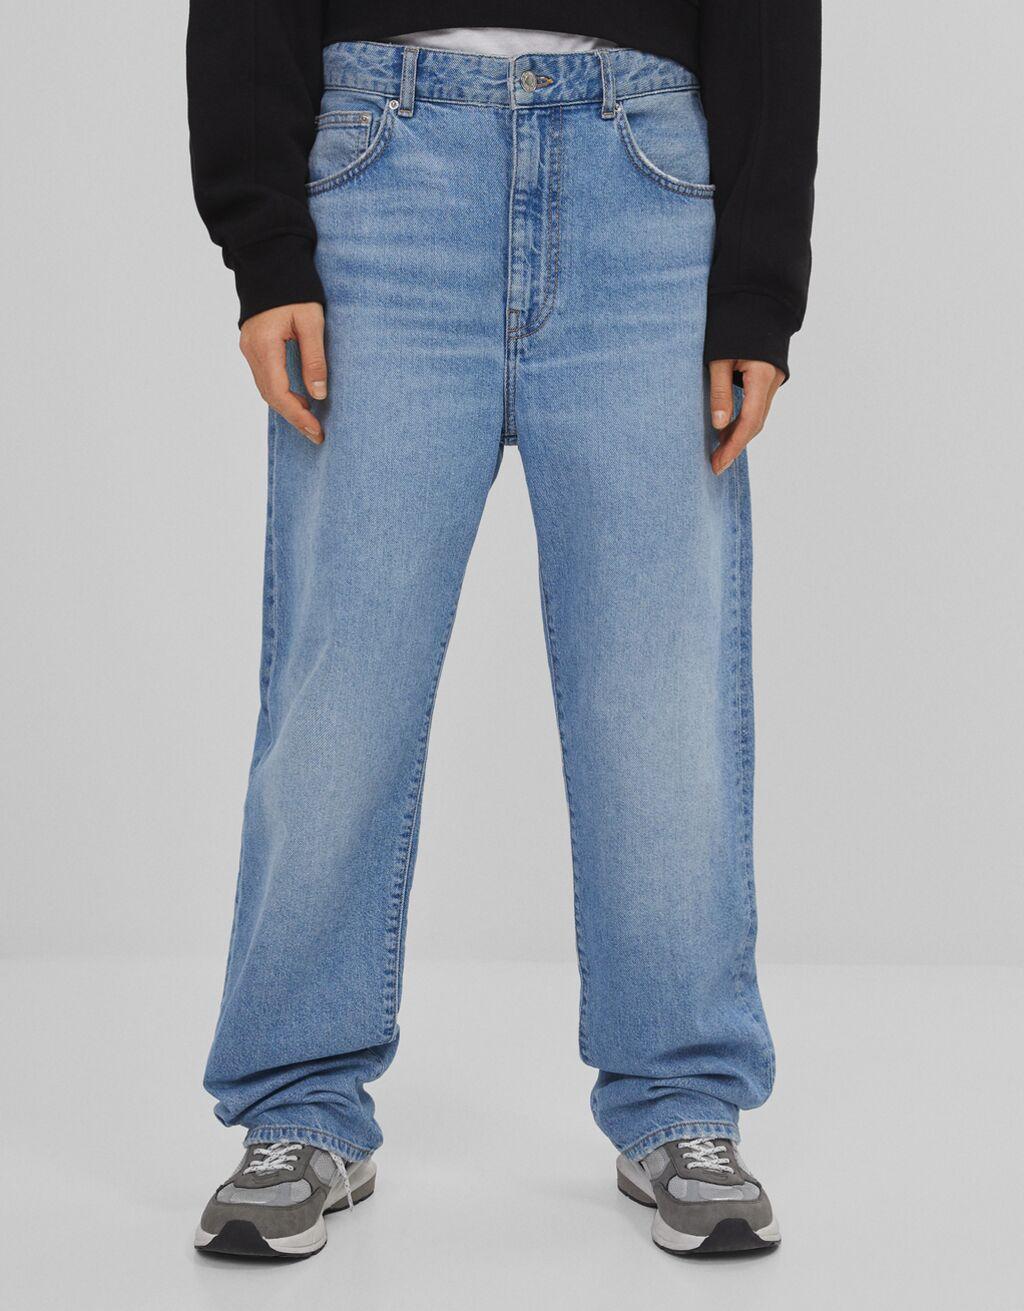 Contaminado Calentar Beneficioso Pantalones Vaqueros Mujer Bershka Ocmeditation Org